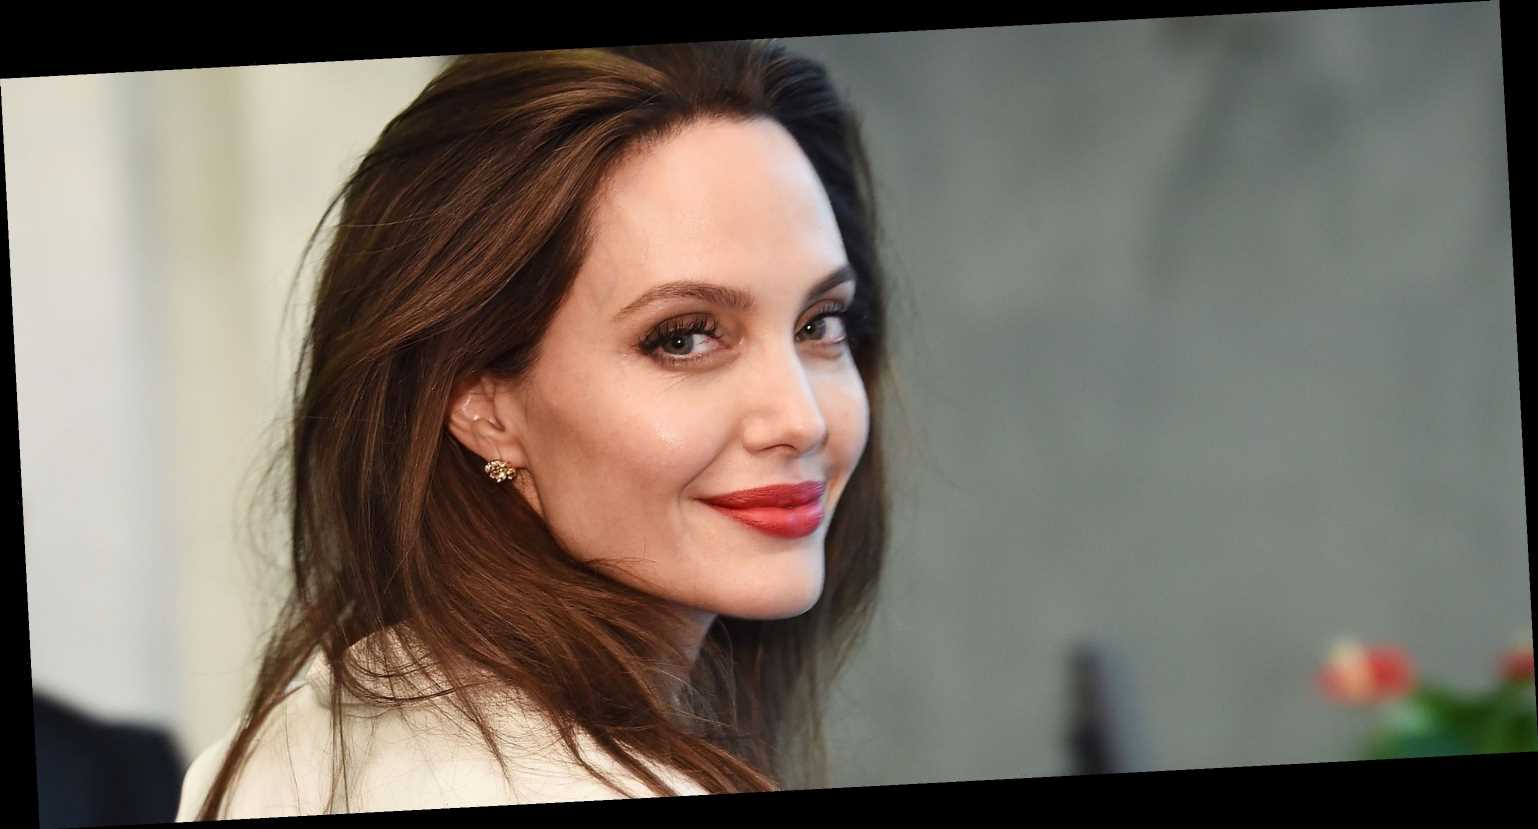 Angelina Jolie Sells Painting Brad Pitt Gave Her for $11.5 Million